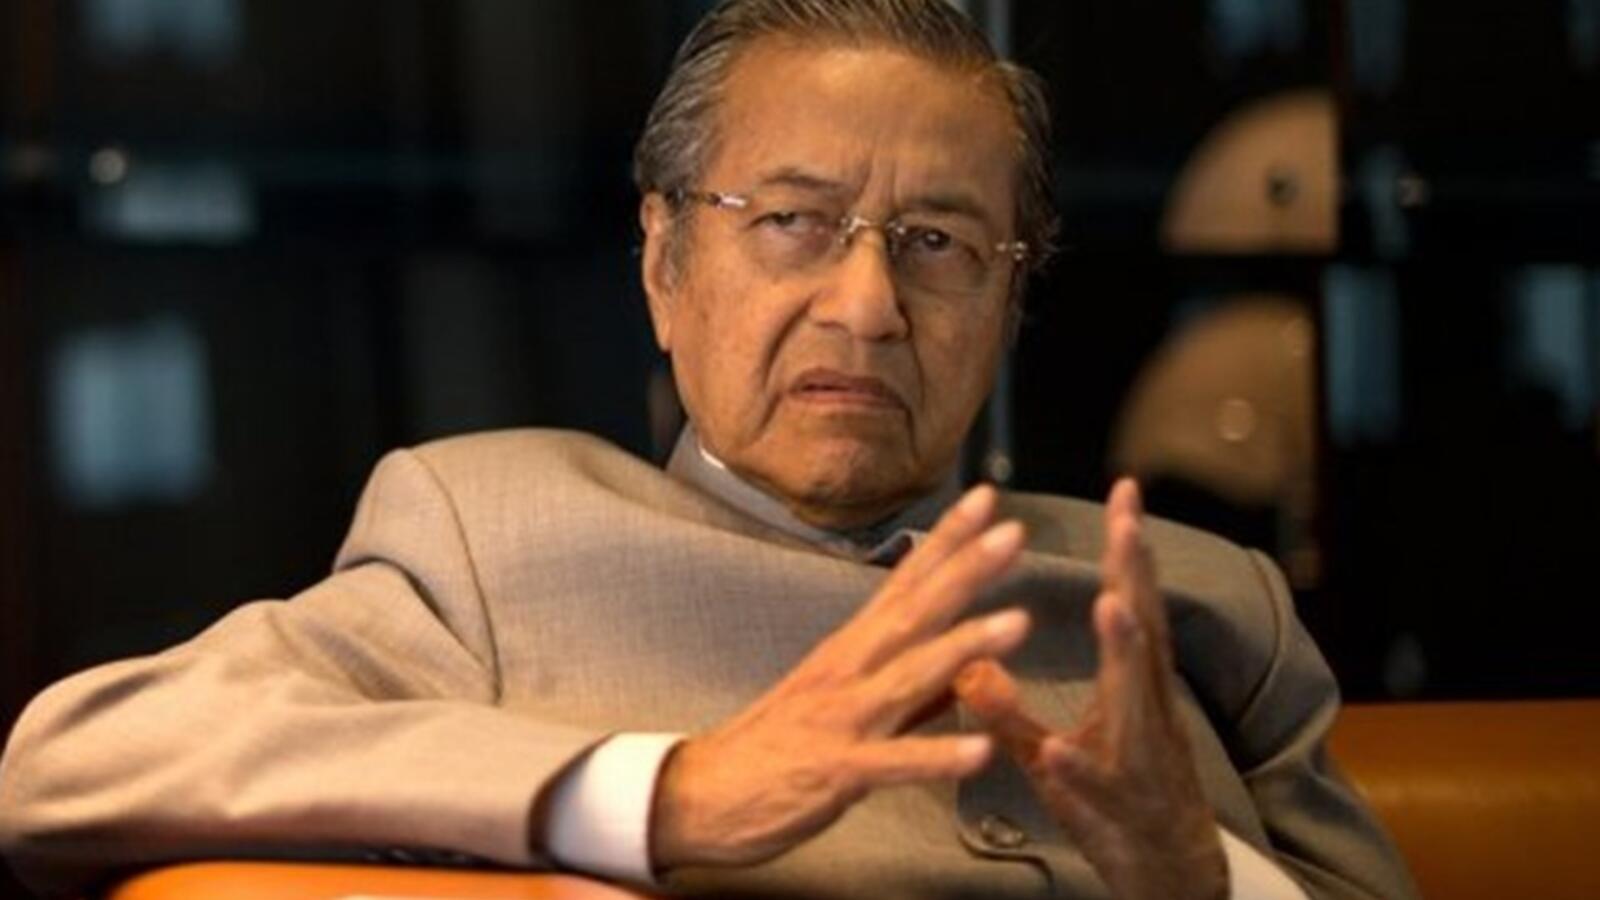 mhatir mhamad kejrkj354 - استقالة مهاتير محمد من رئاسة وزراء ماليزيا